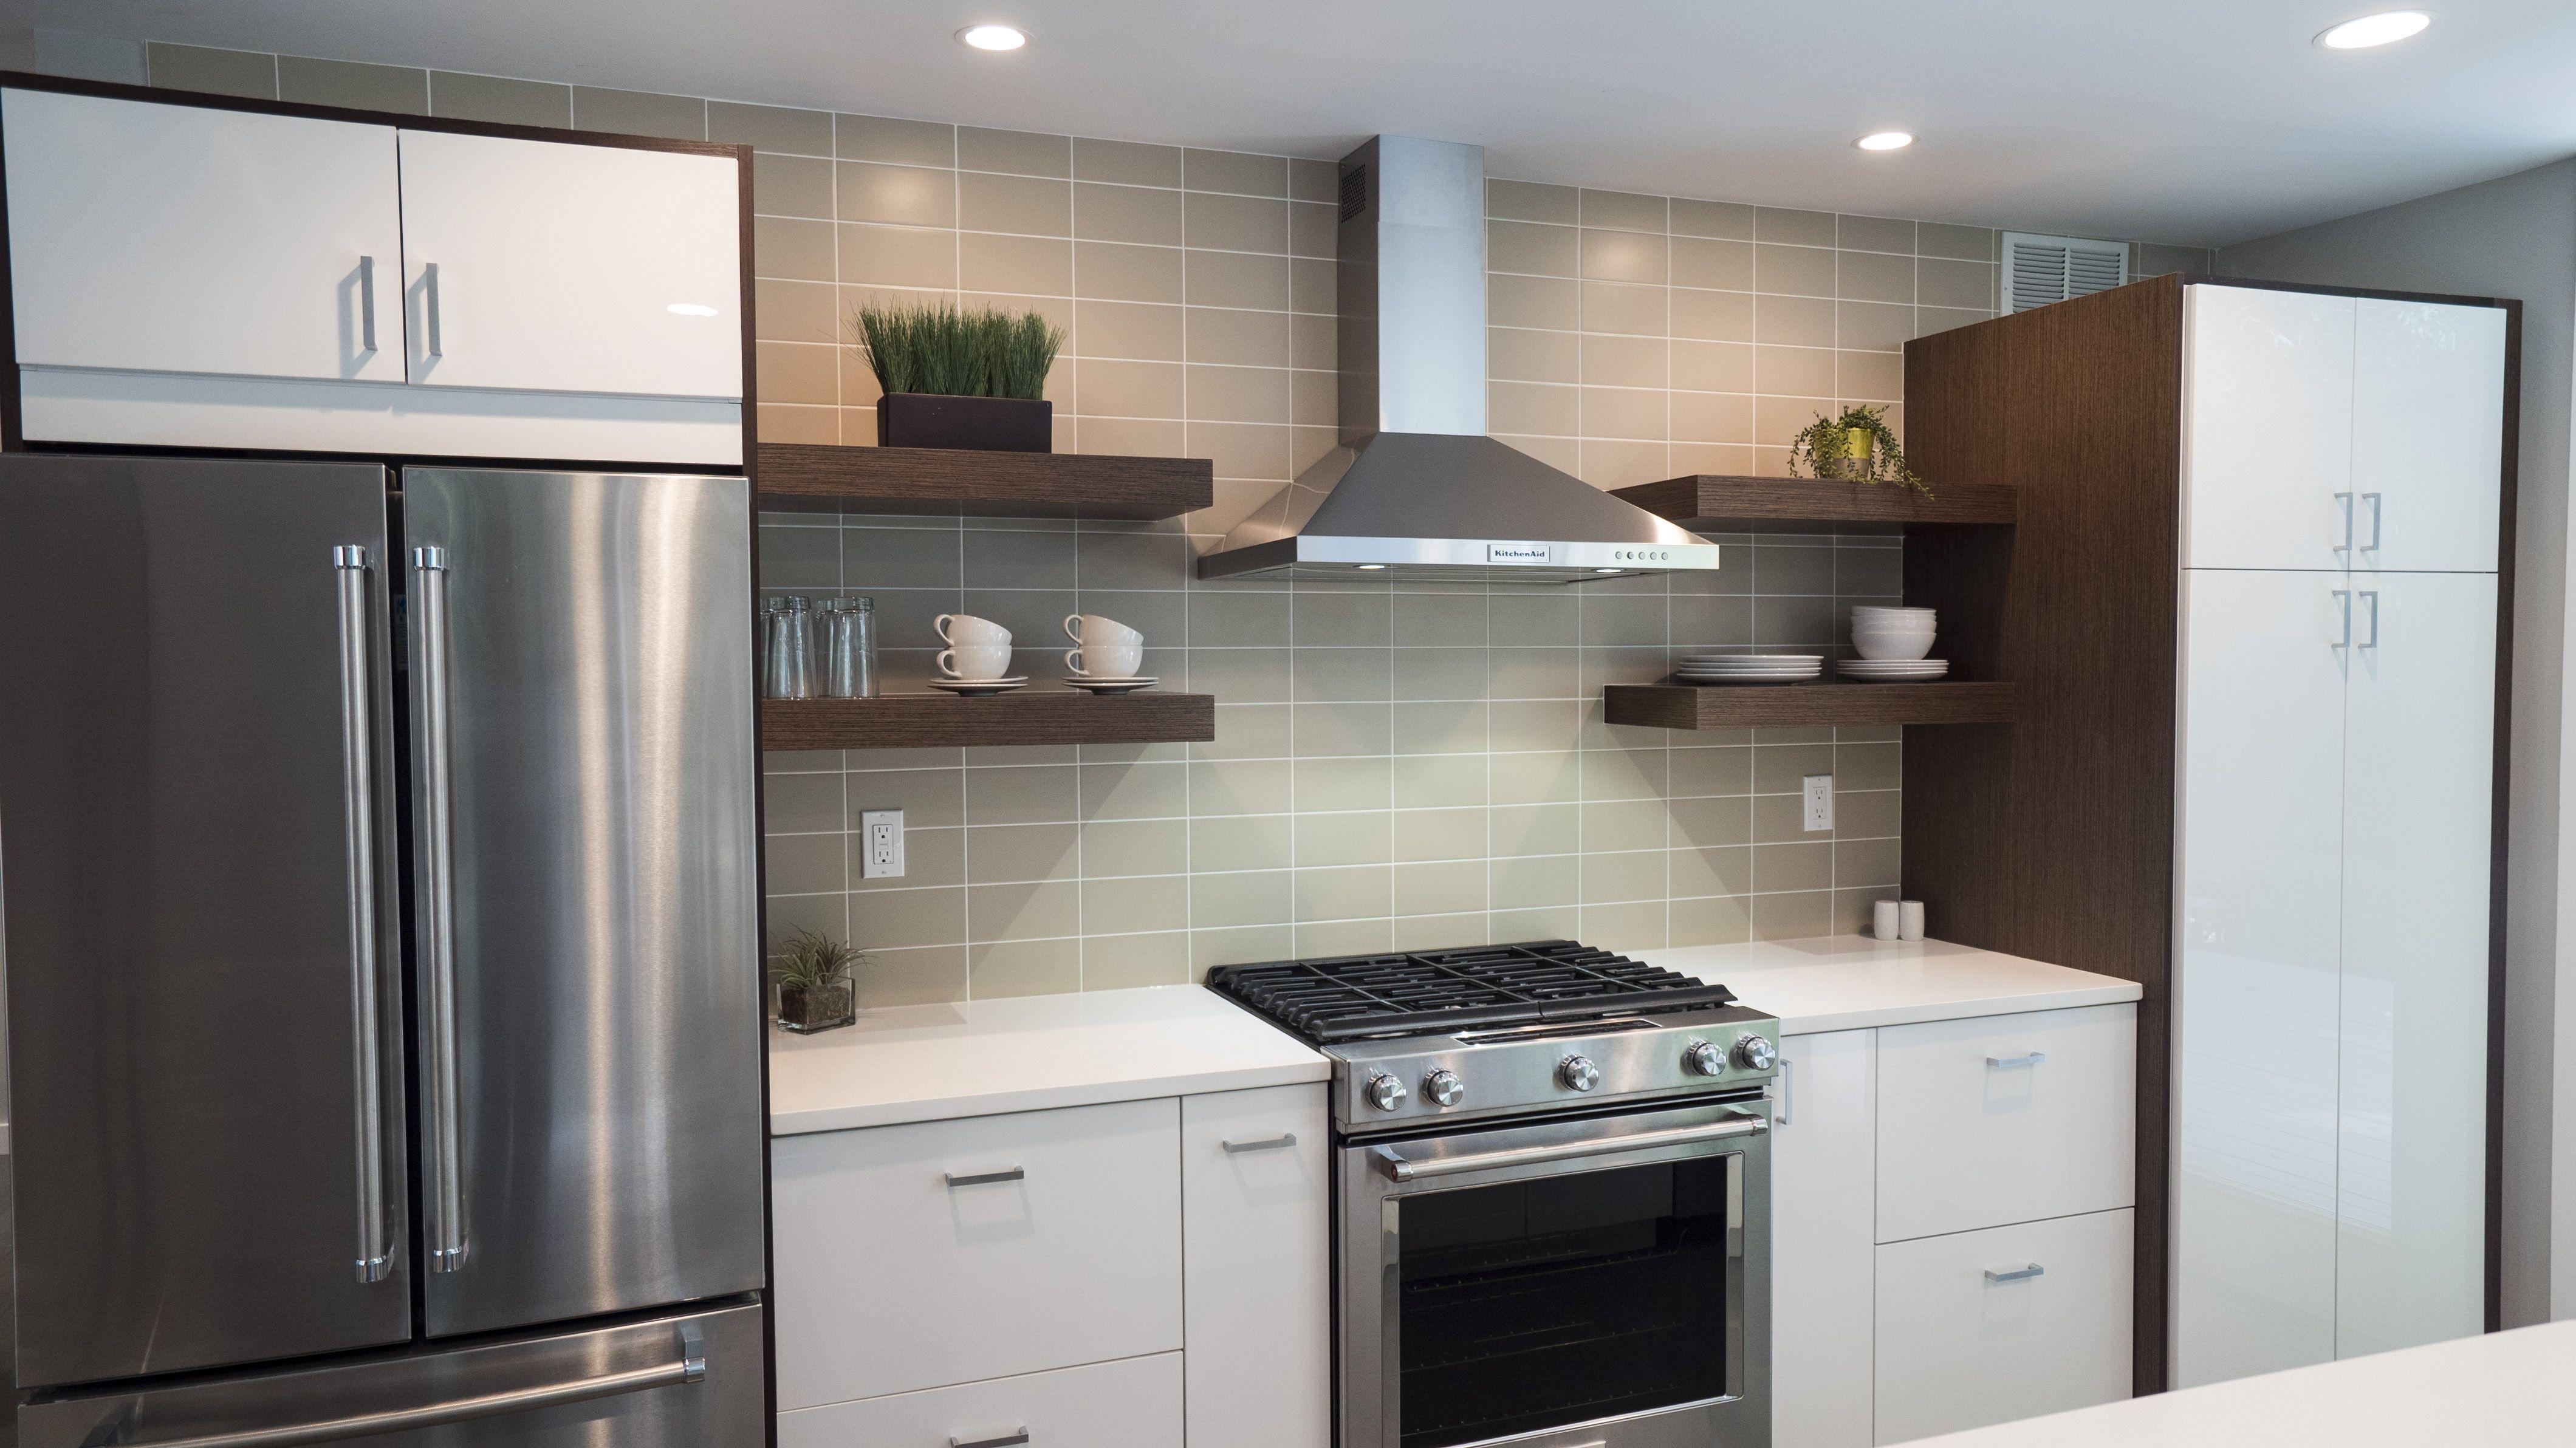 Pin On Beechwood Project Kitchen Cabinets In Alexandria Va